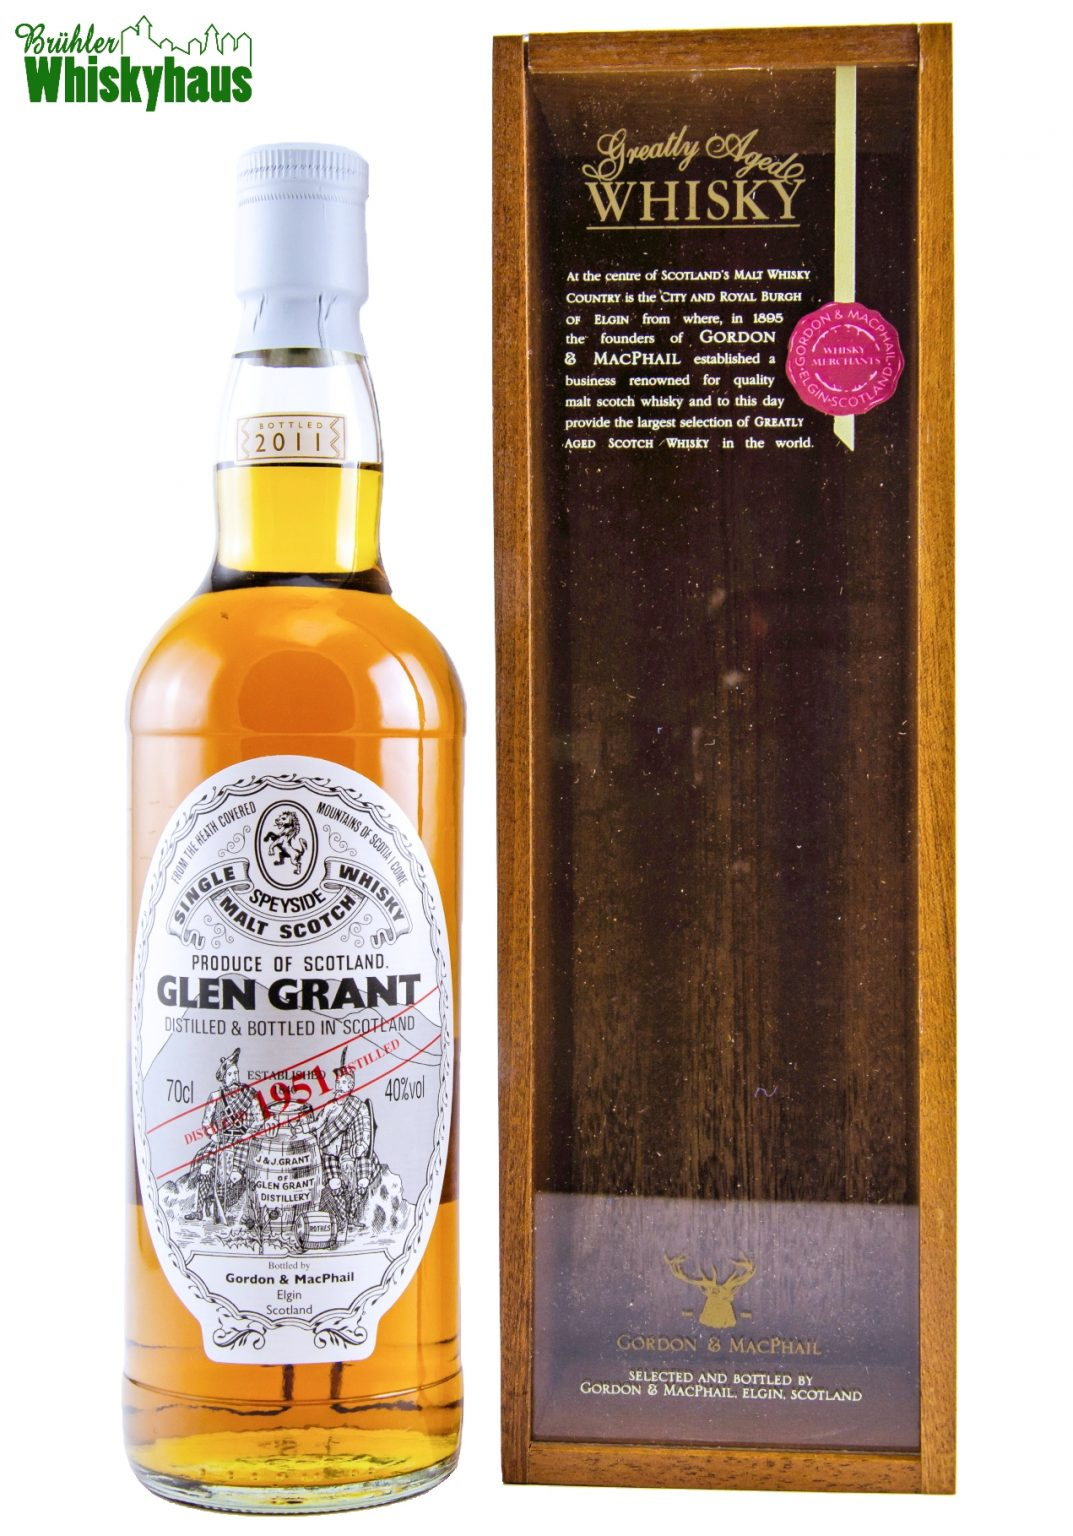 Glen Grant Vintage 1951 - 59 Jahre - Sherry Butt - Gordon & MacPhail - Single Malt Scotch Whisky